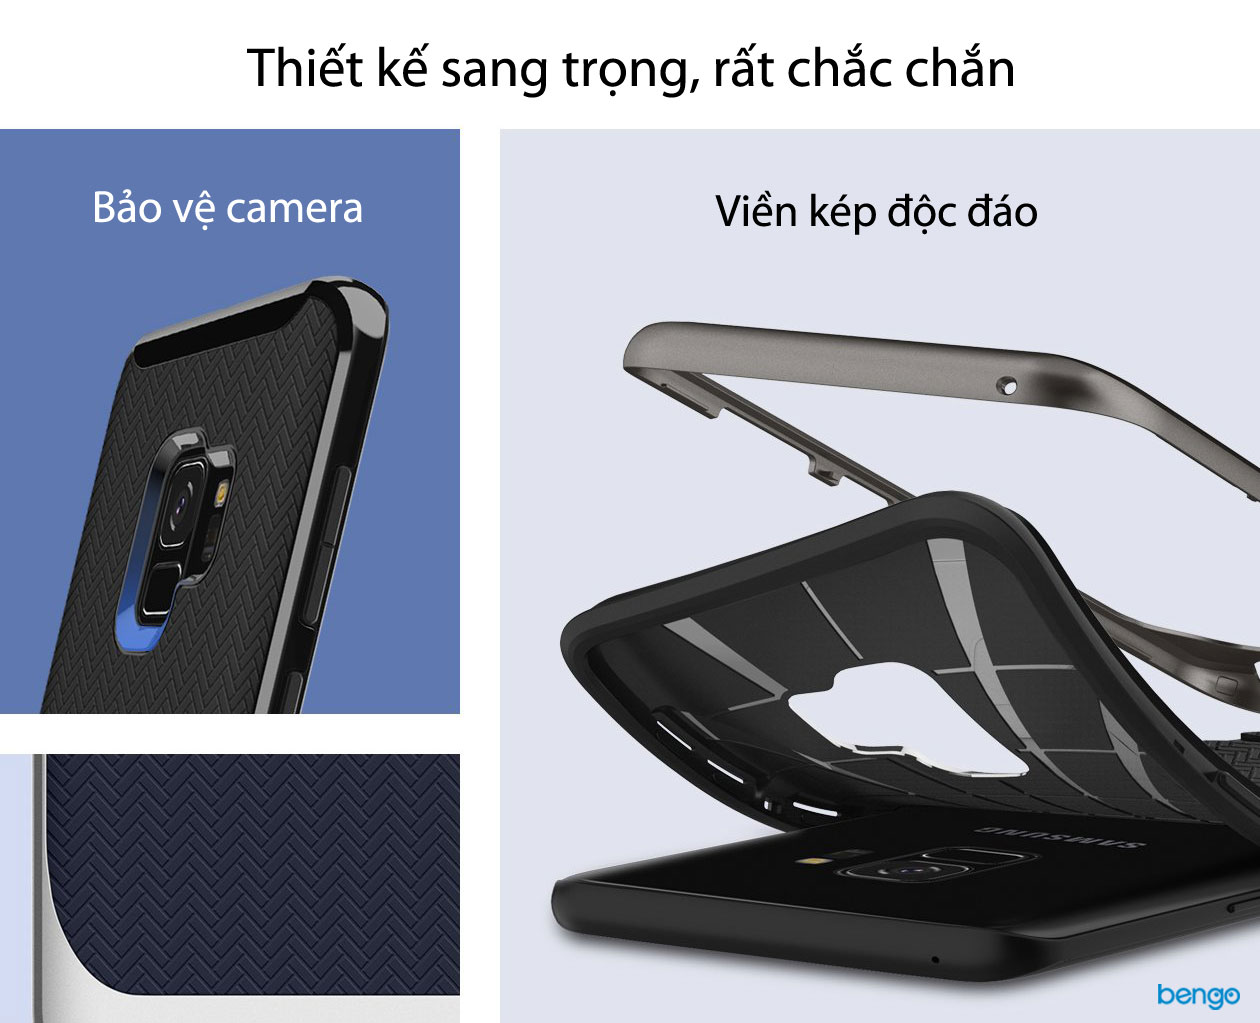 Ốp lưng Samsung Galaxy S9 SPIGEN Neo Hybrid™ - Burgundy